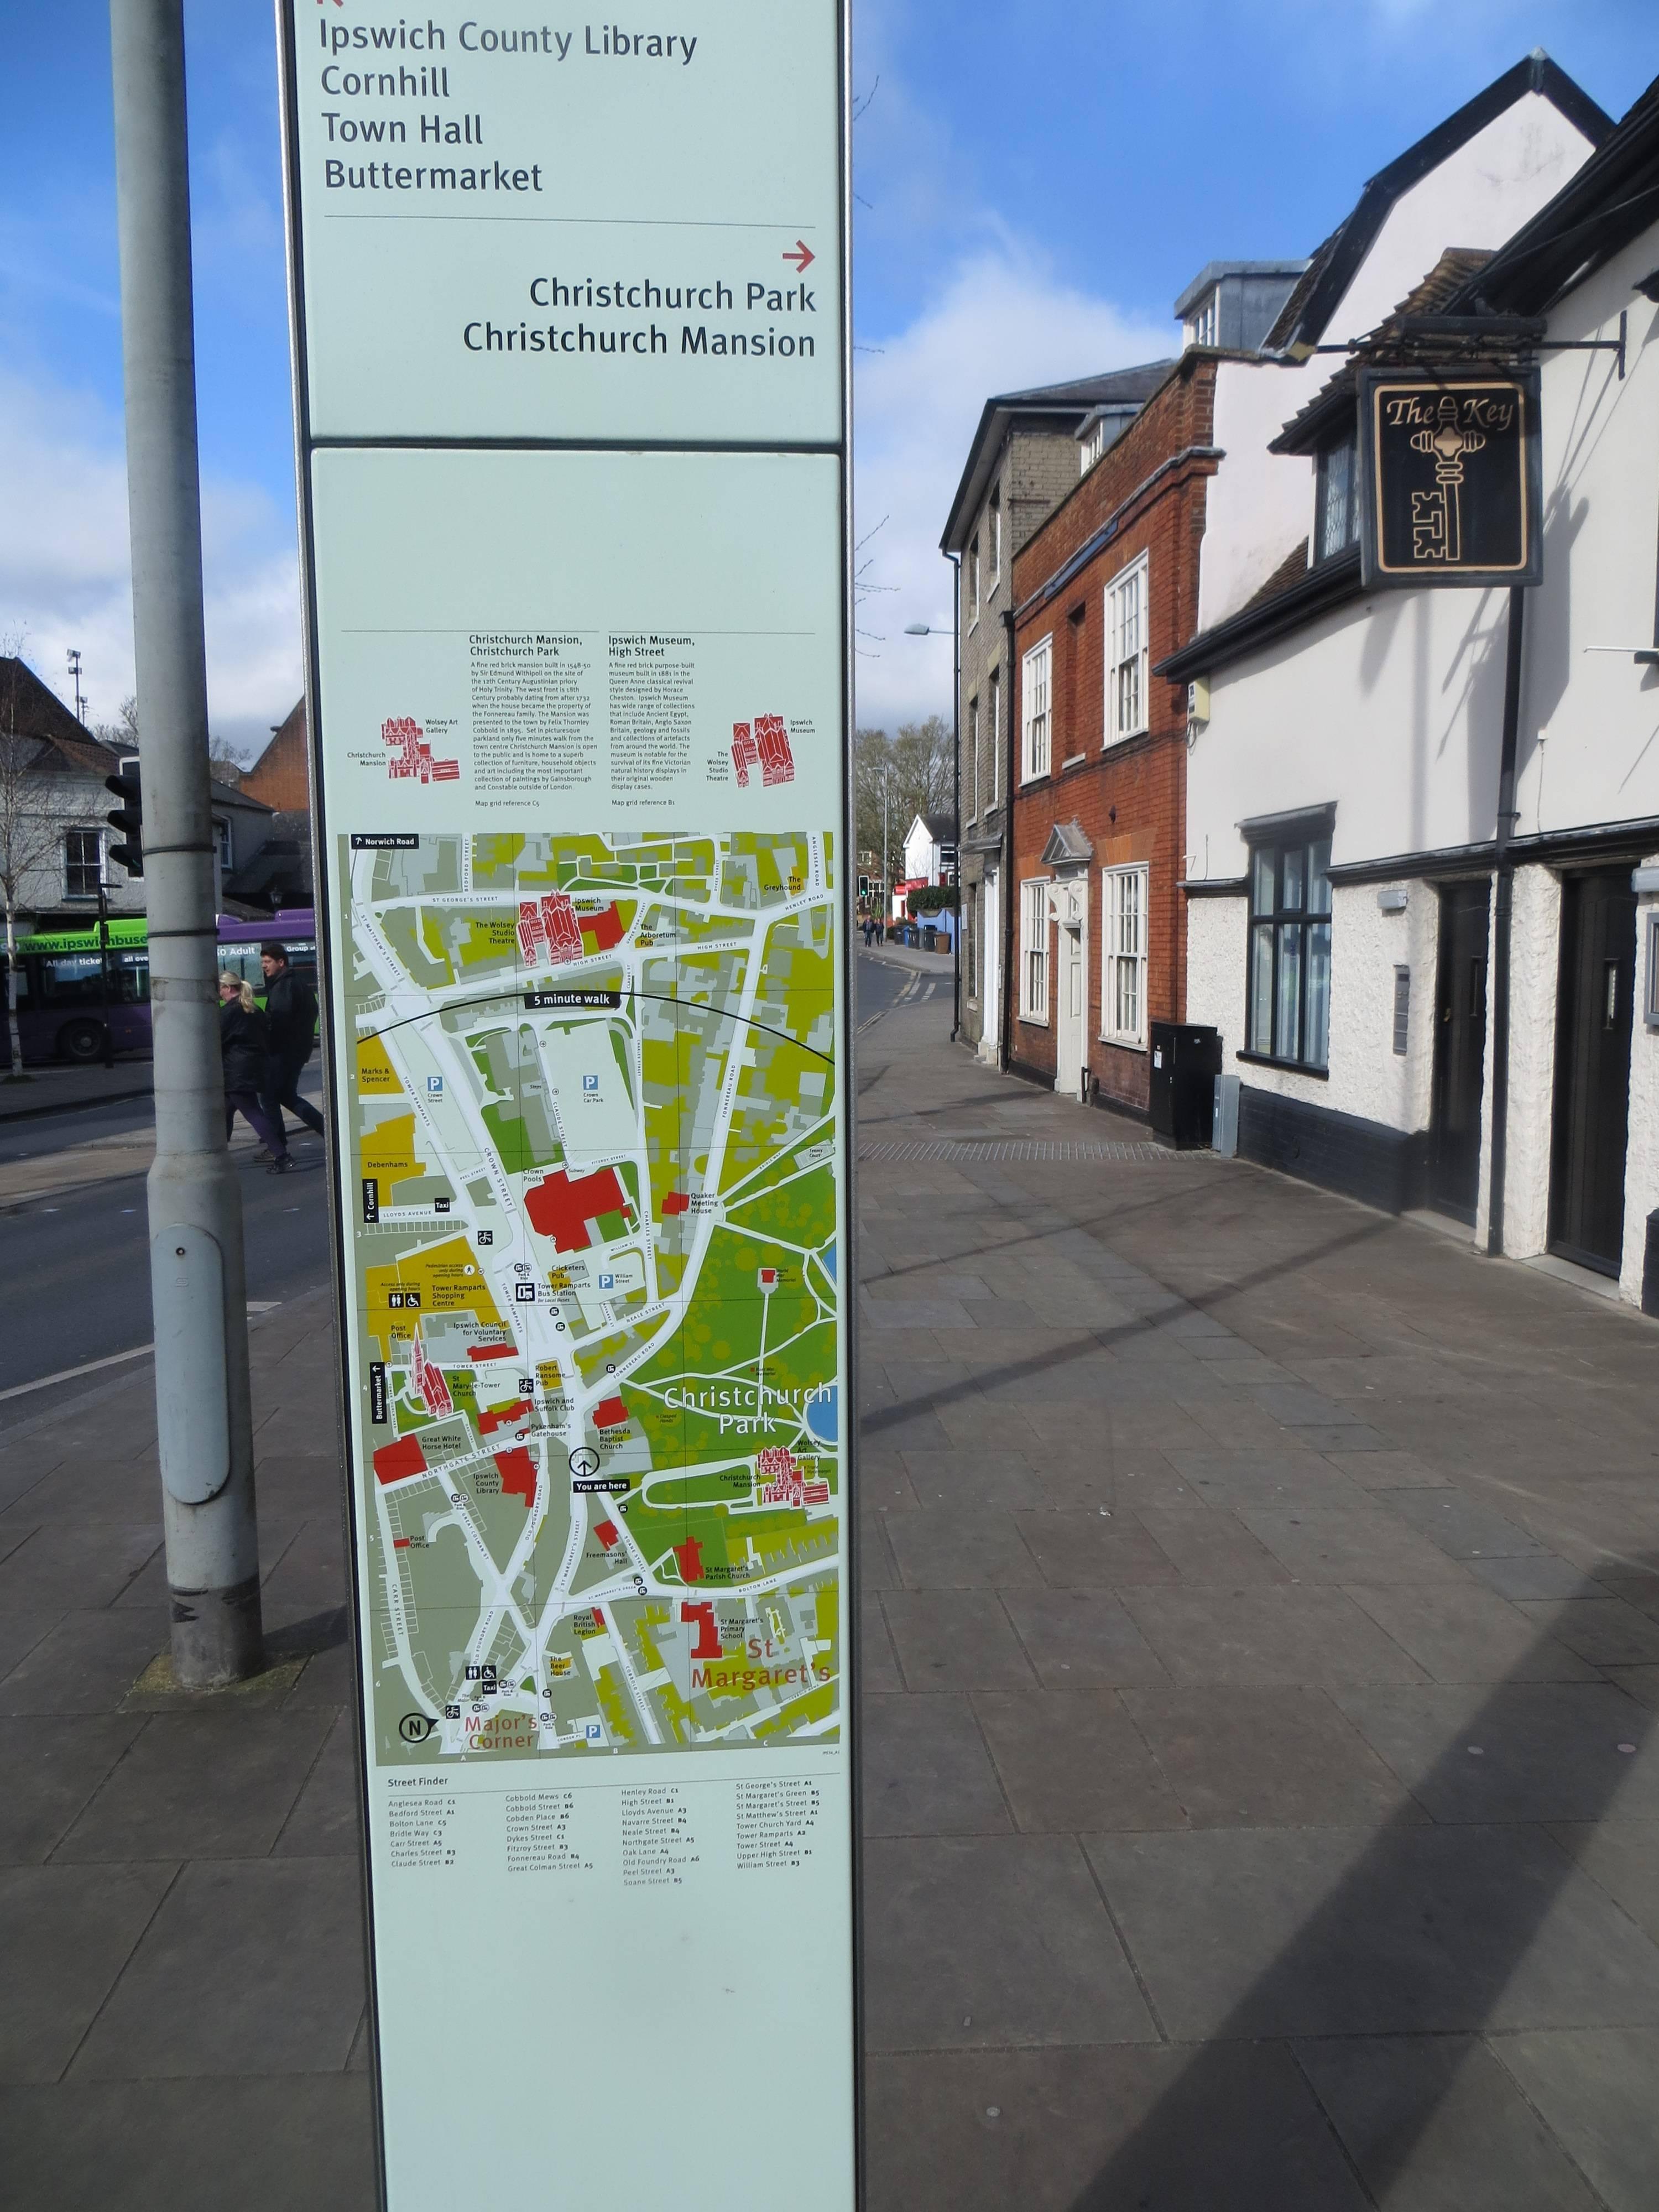 ipswich street maps